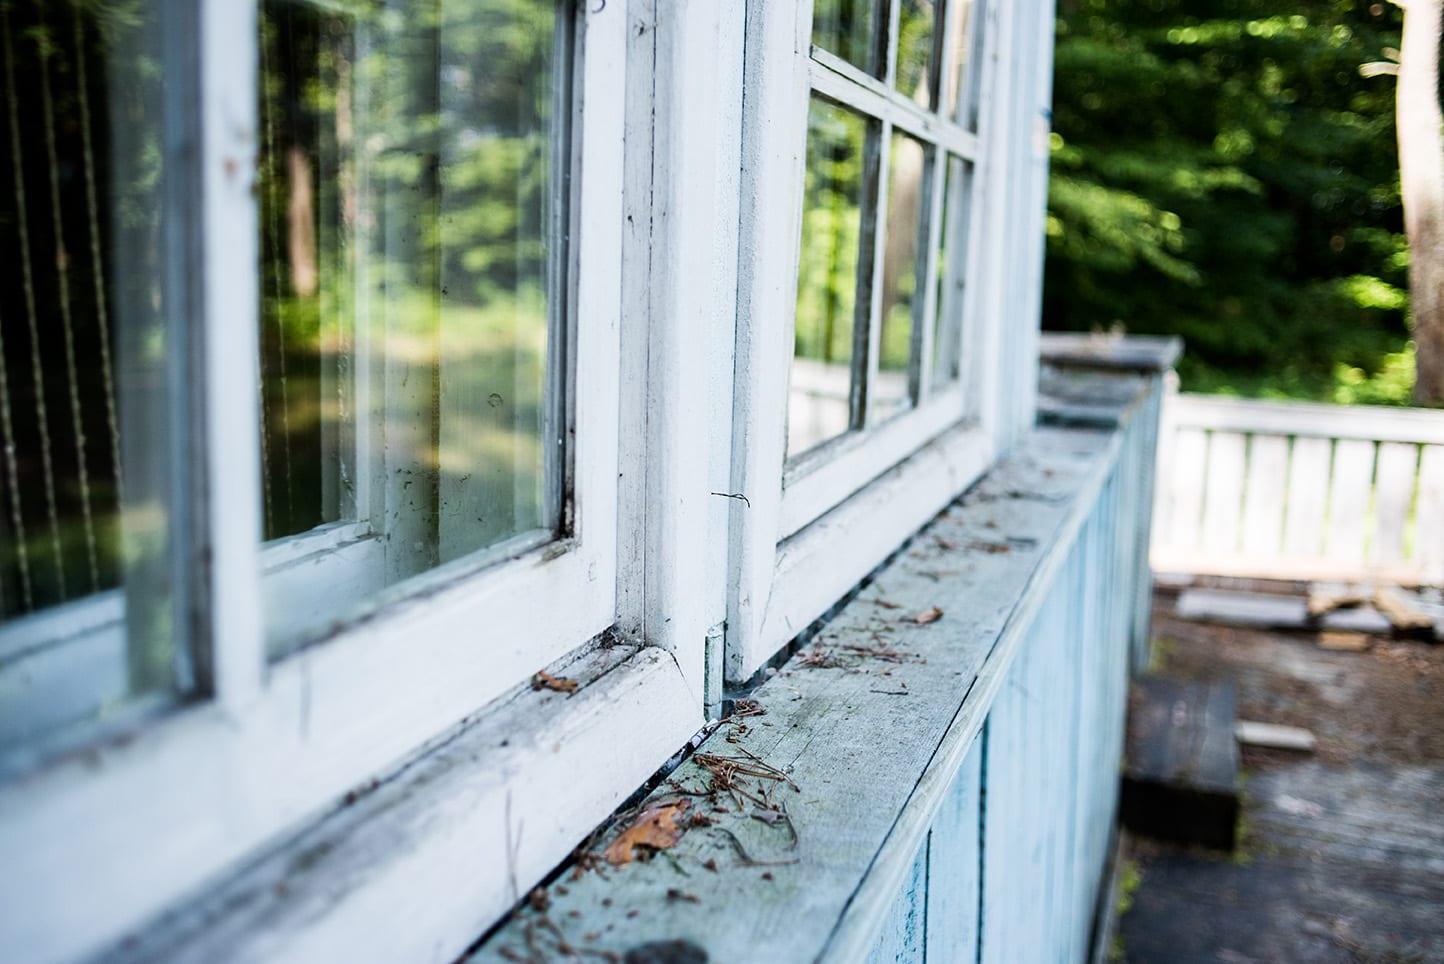 Older window